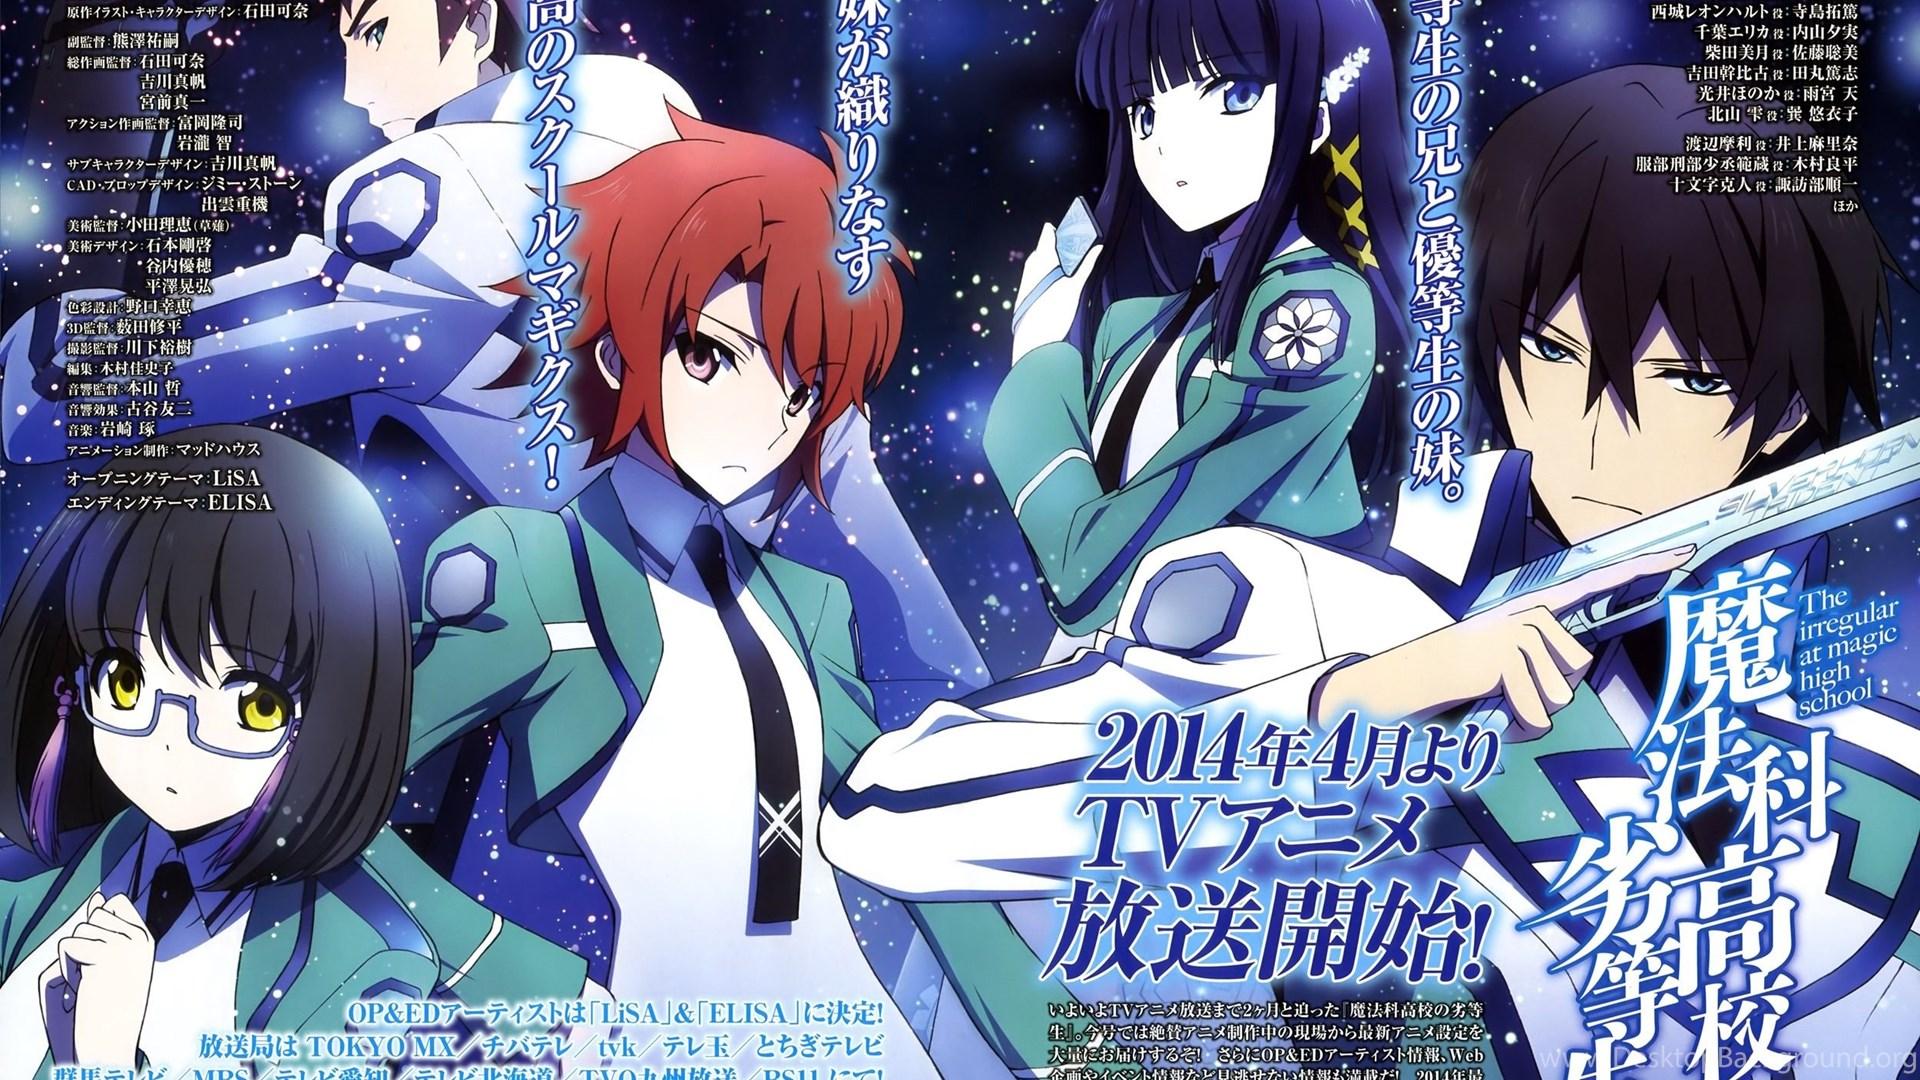 Mahouka Koukou No Rettousei Anime 2014 Images Hd Wallpapers